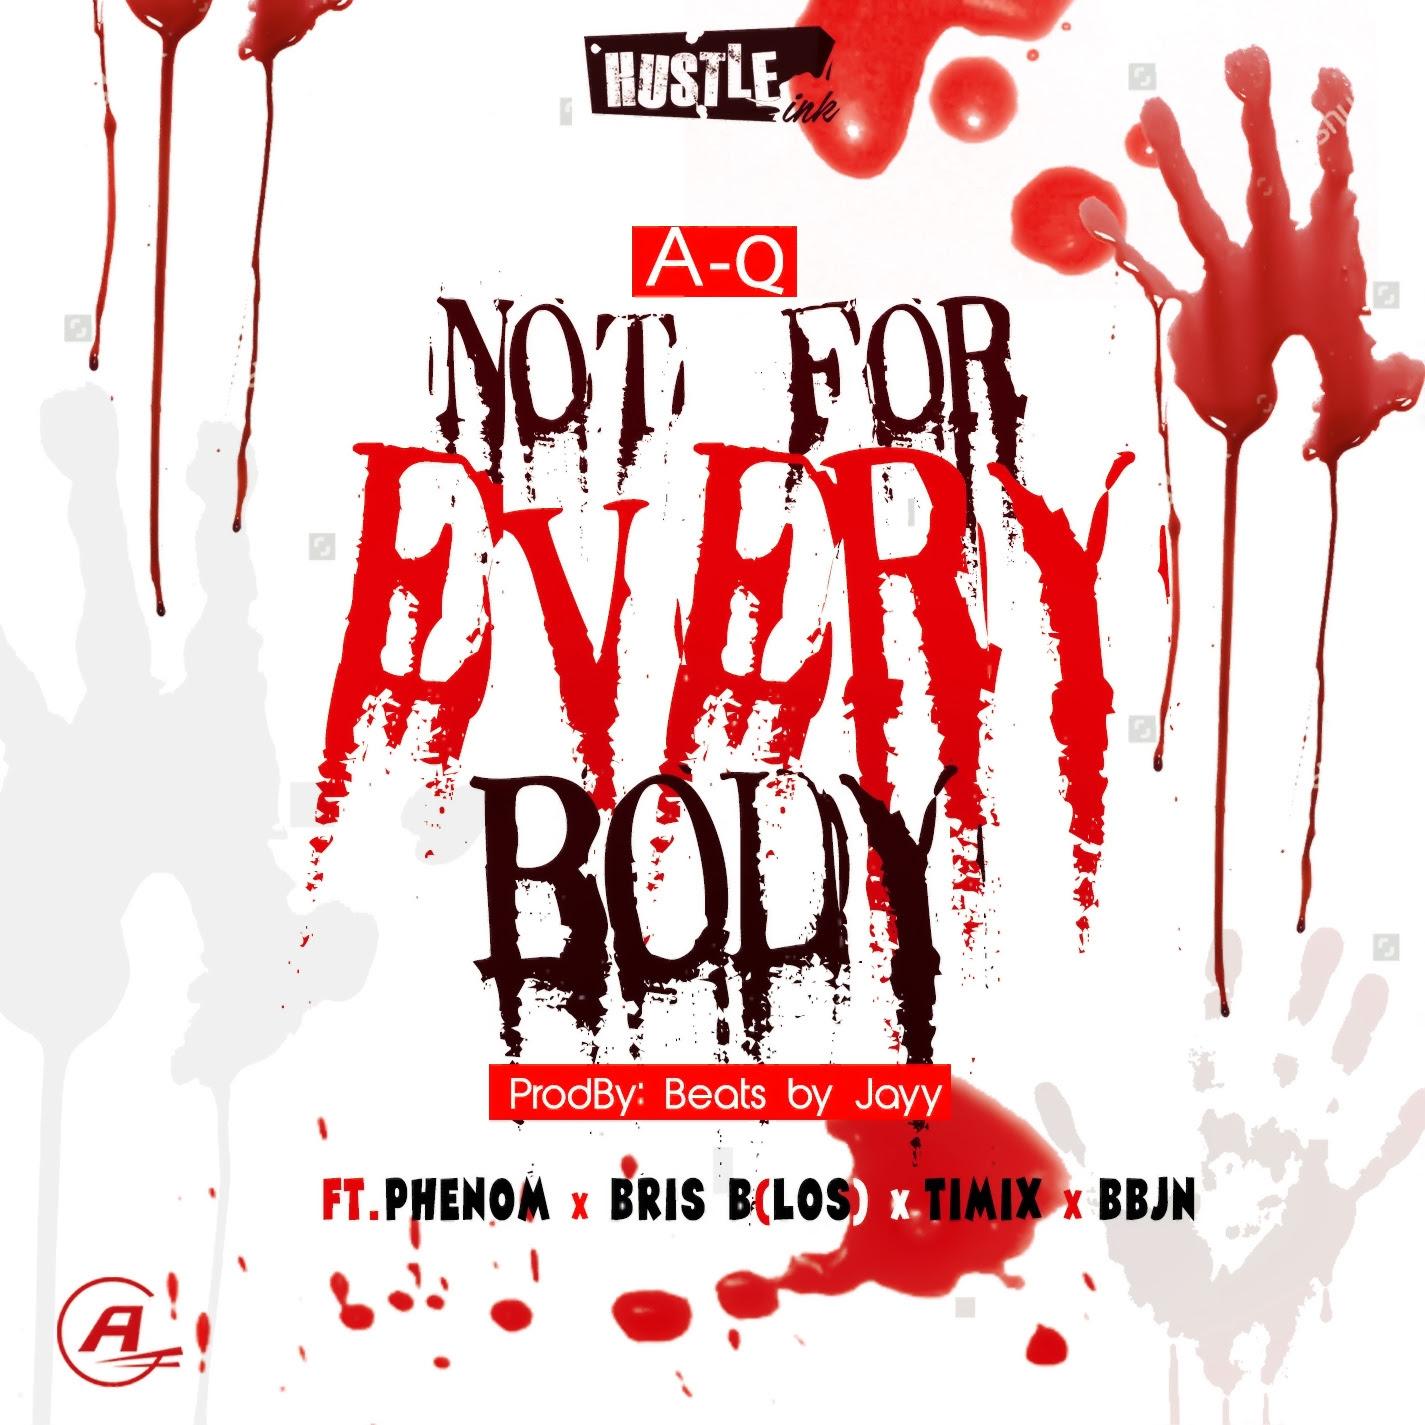 A-Q - Not For Everybody ft. Phenom, Bris B , Timix X BBJN